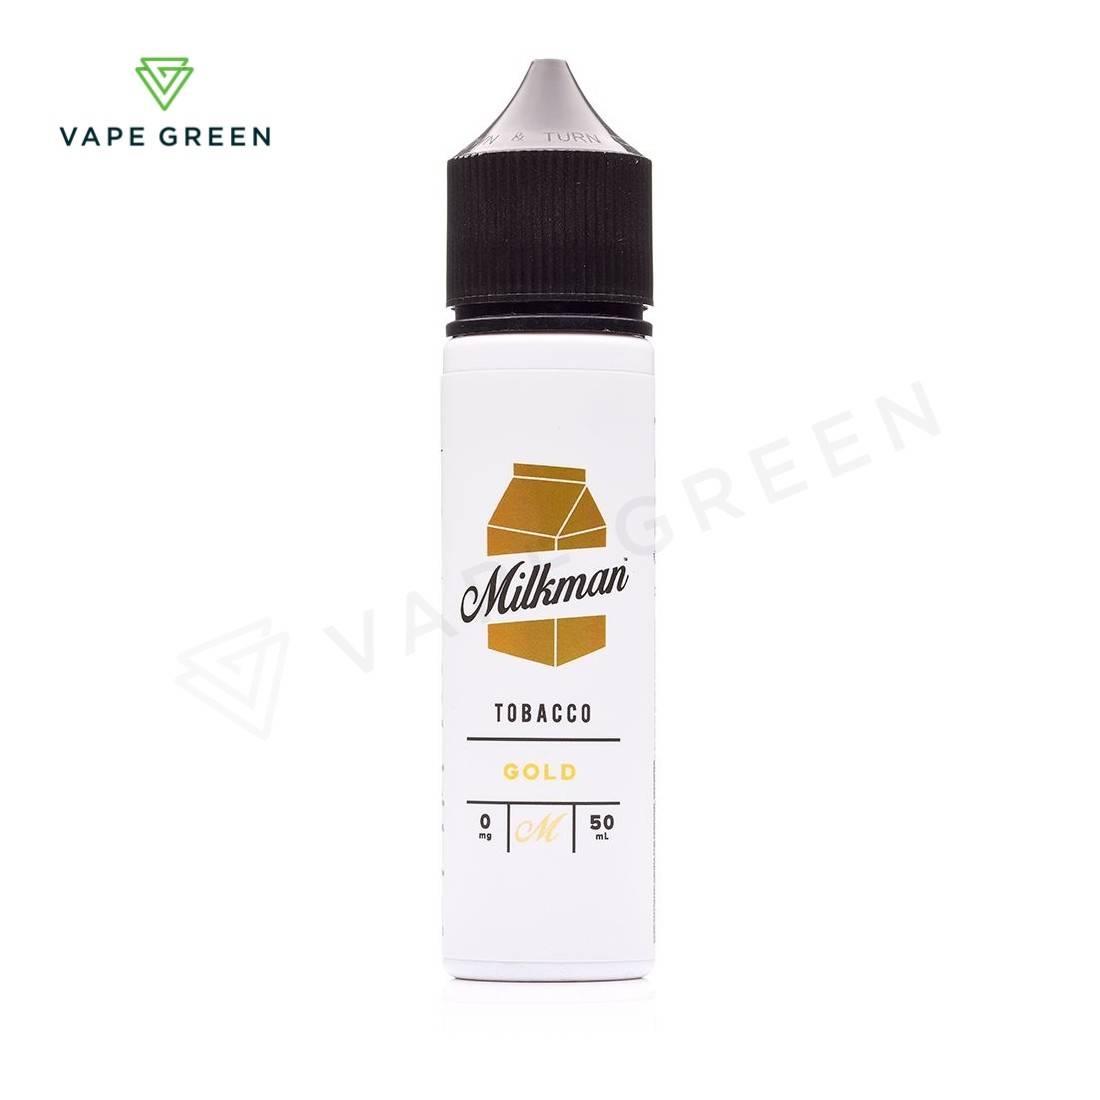 Gold E-Liquid by The Milkman Heritage 50ml